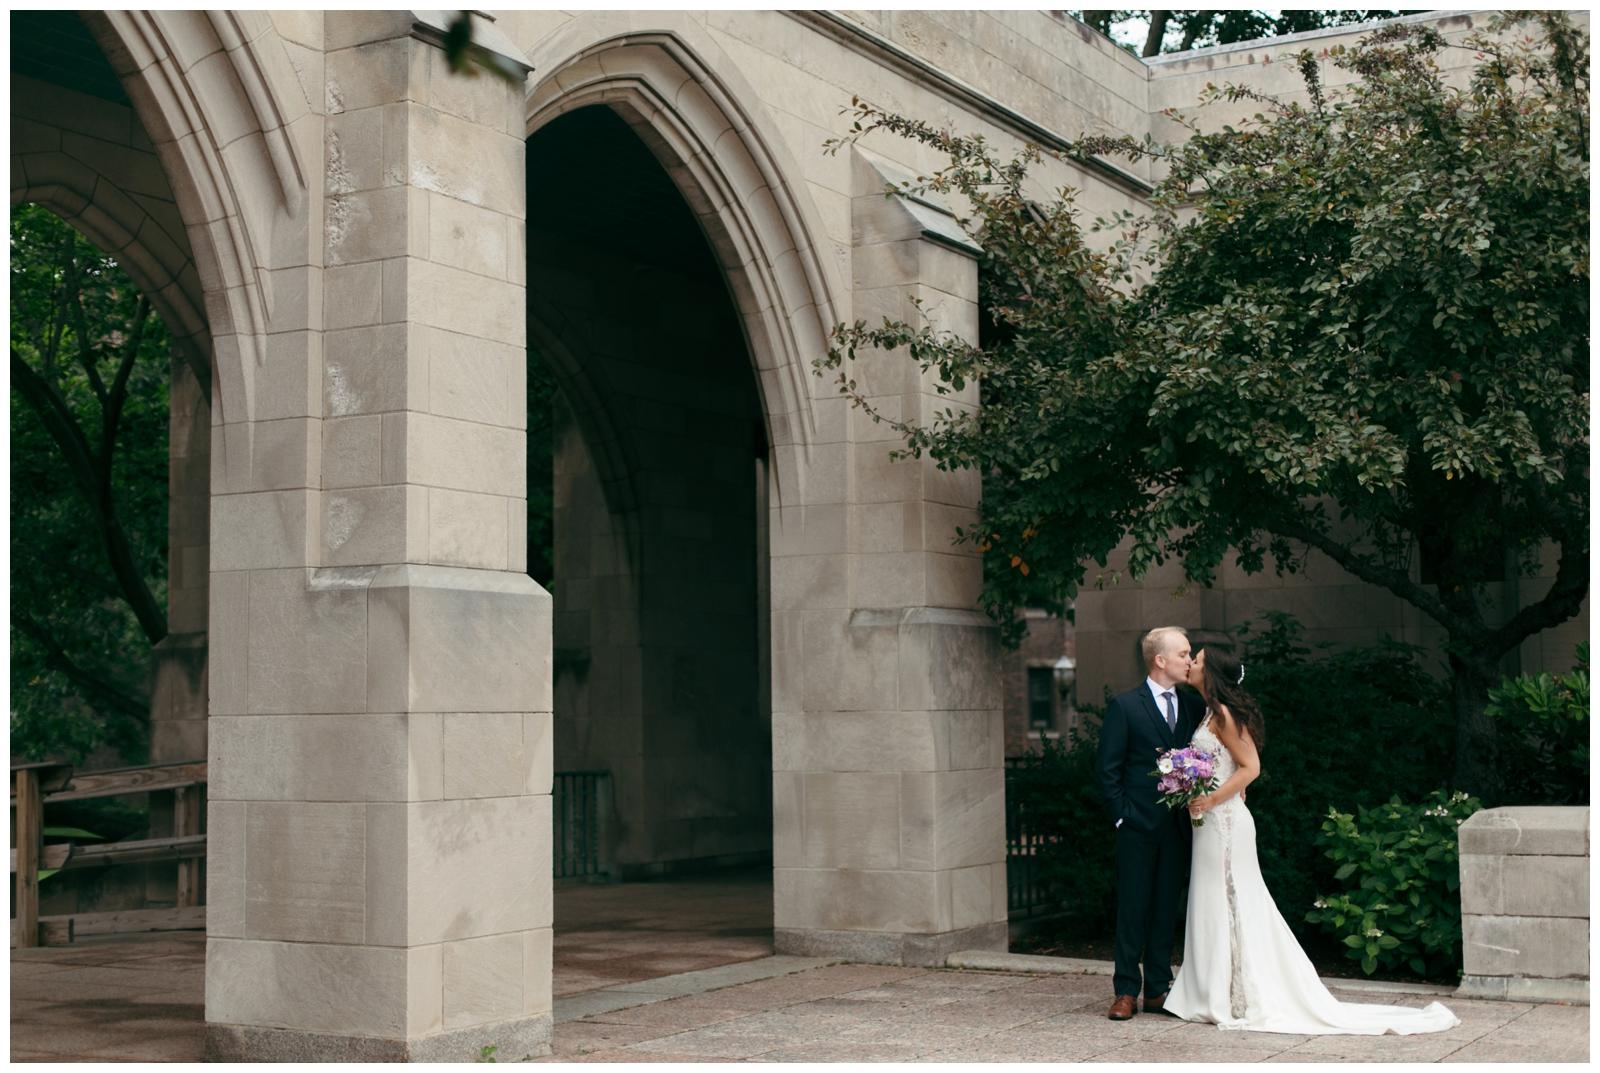 Bailey-Q-Photo-Royal-Sonesta-Boston-Wedding-Photographer-038.jpg